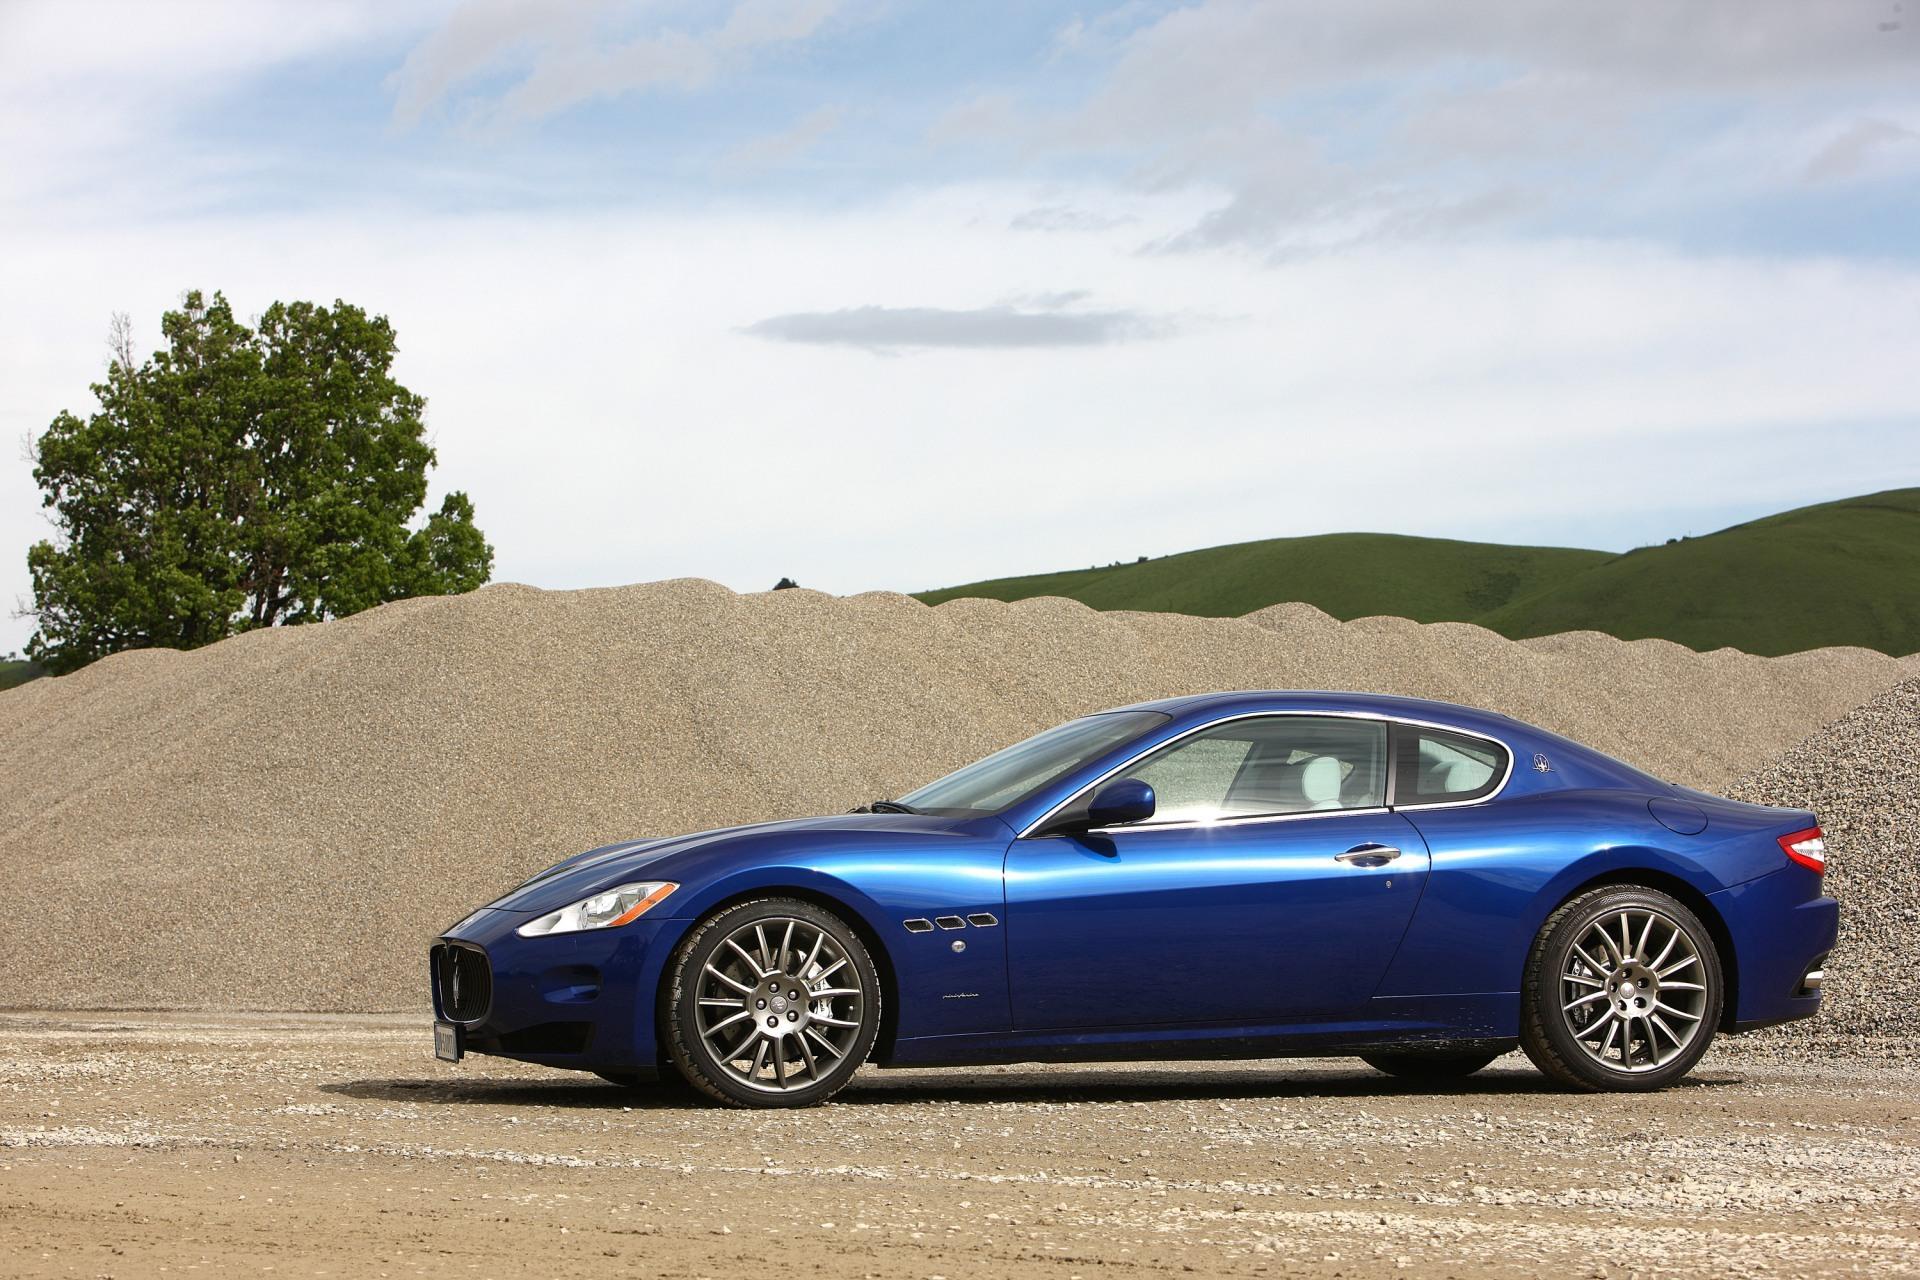 Geneva Auto Sales >> 2010 Maserati GranTurismo - conceptcarz.com